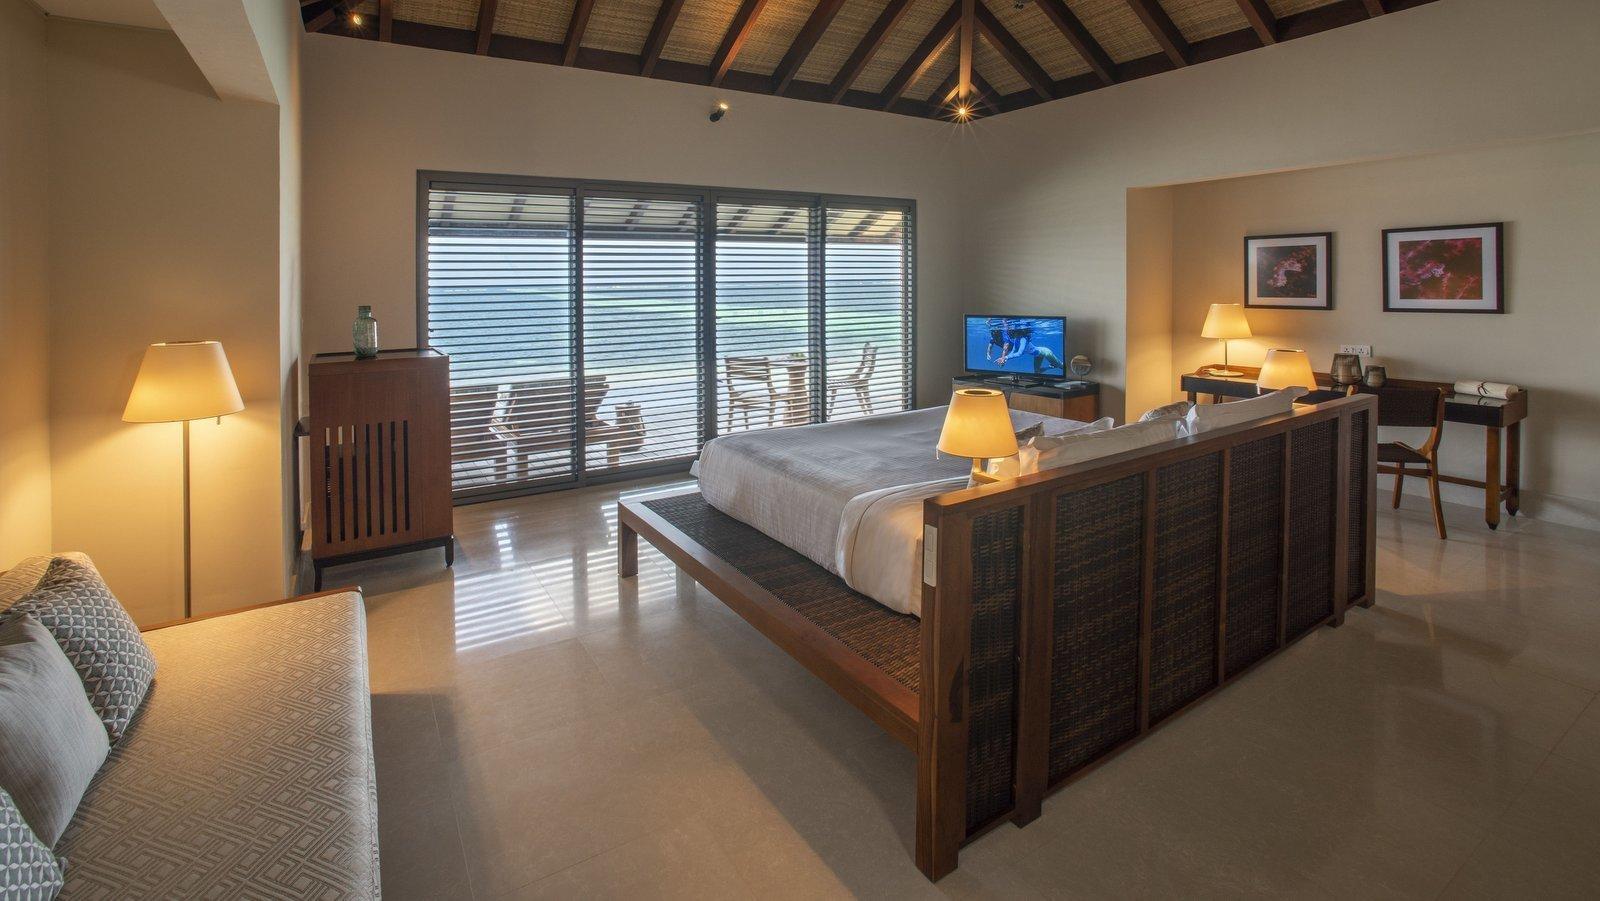 Мальдивы, отель The Residence Maldives at Dhigurah, номер Lagoon Pool Villa